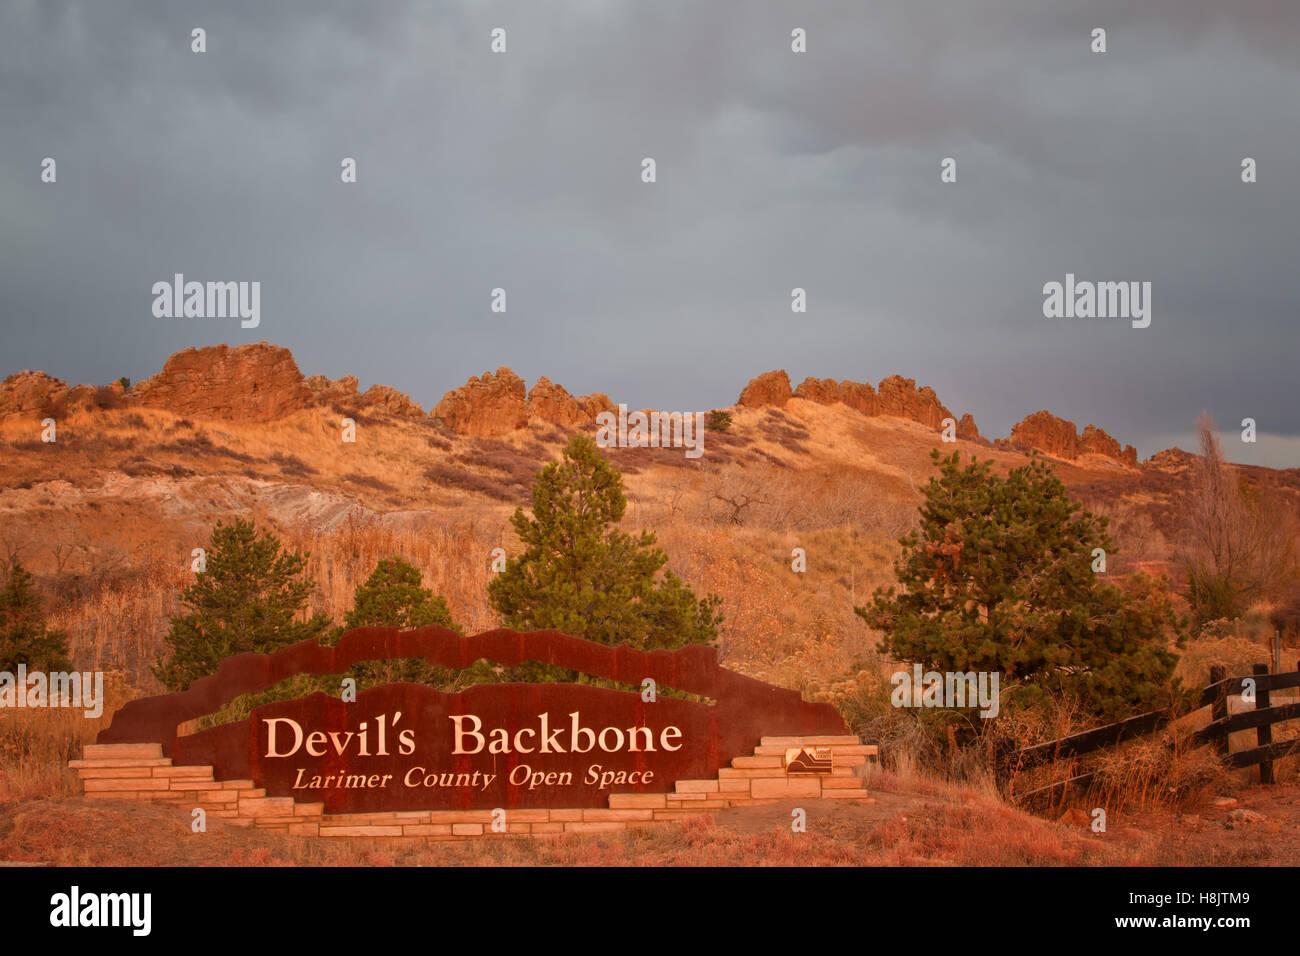 Devil's Backbone Larimer County Open Space - popular hiking and biking open space in Loveland Colorado - Stock Image